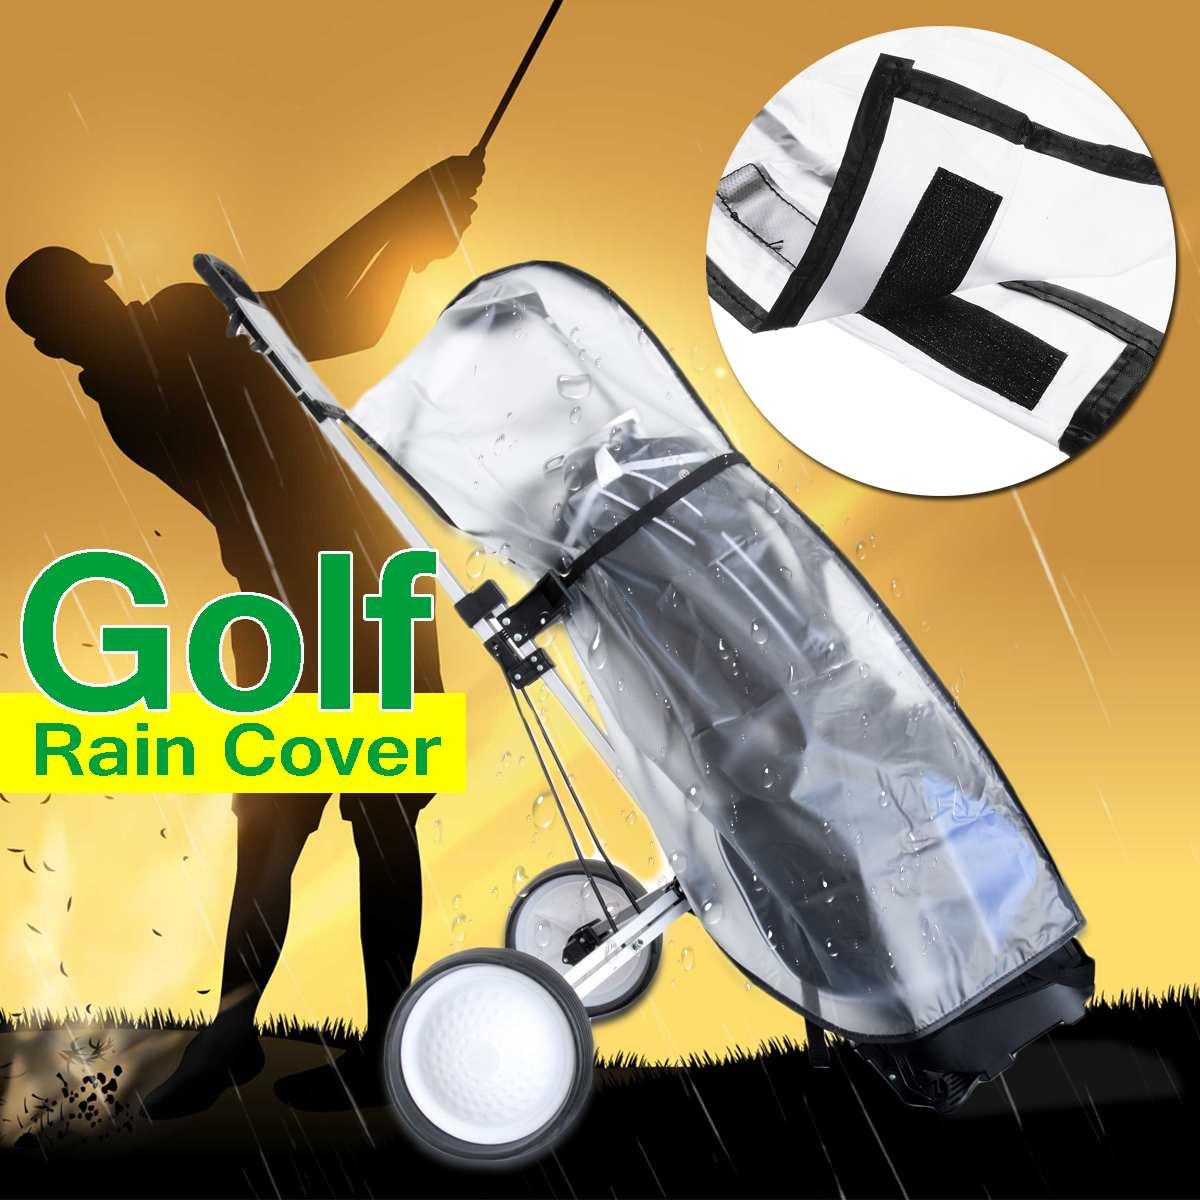 Protector Shield Golf-Bag Standard-Ball Transparent Dustproof Outdoor Rod PVC Store Anti-Dust